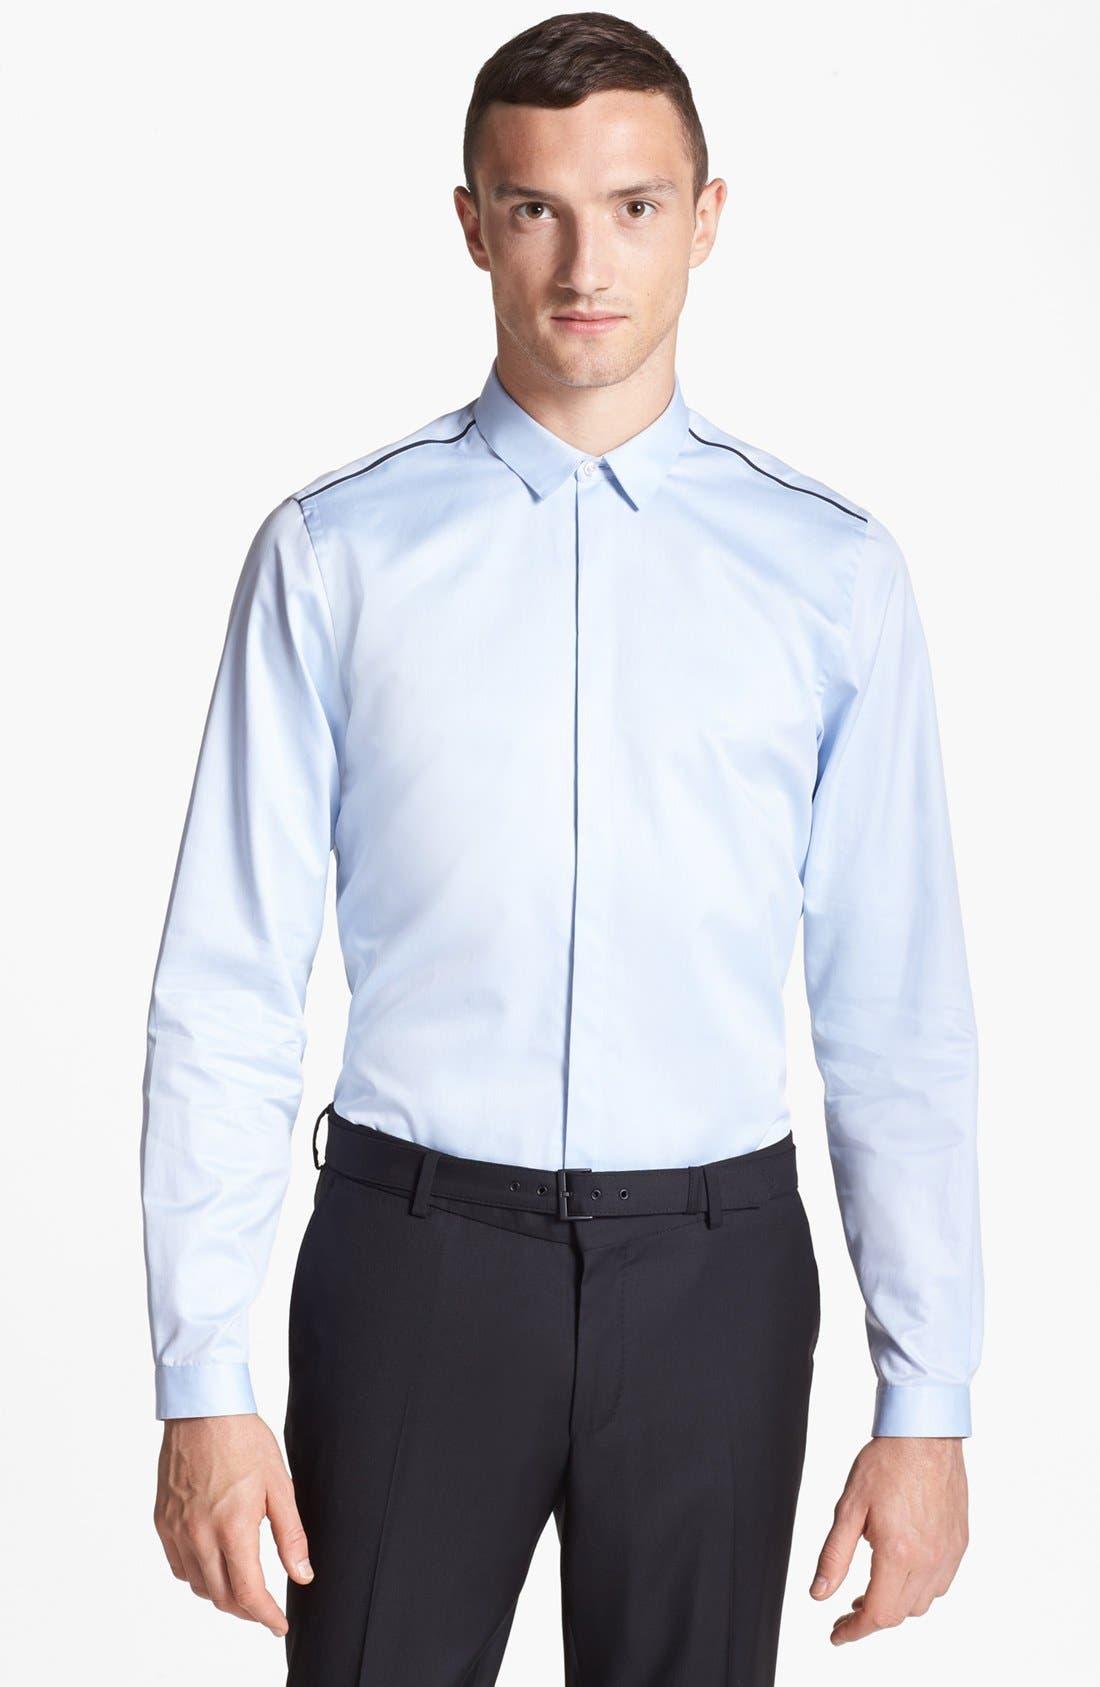 Alternate Image 1 Selected - The Kooples Contrast Trim Dress Shirt